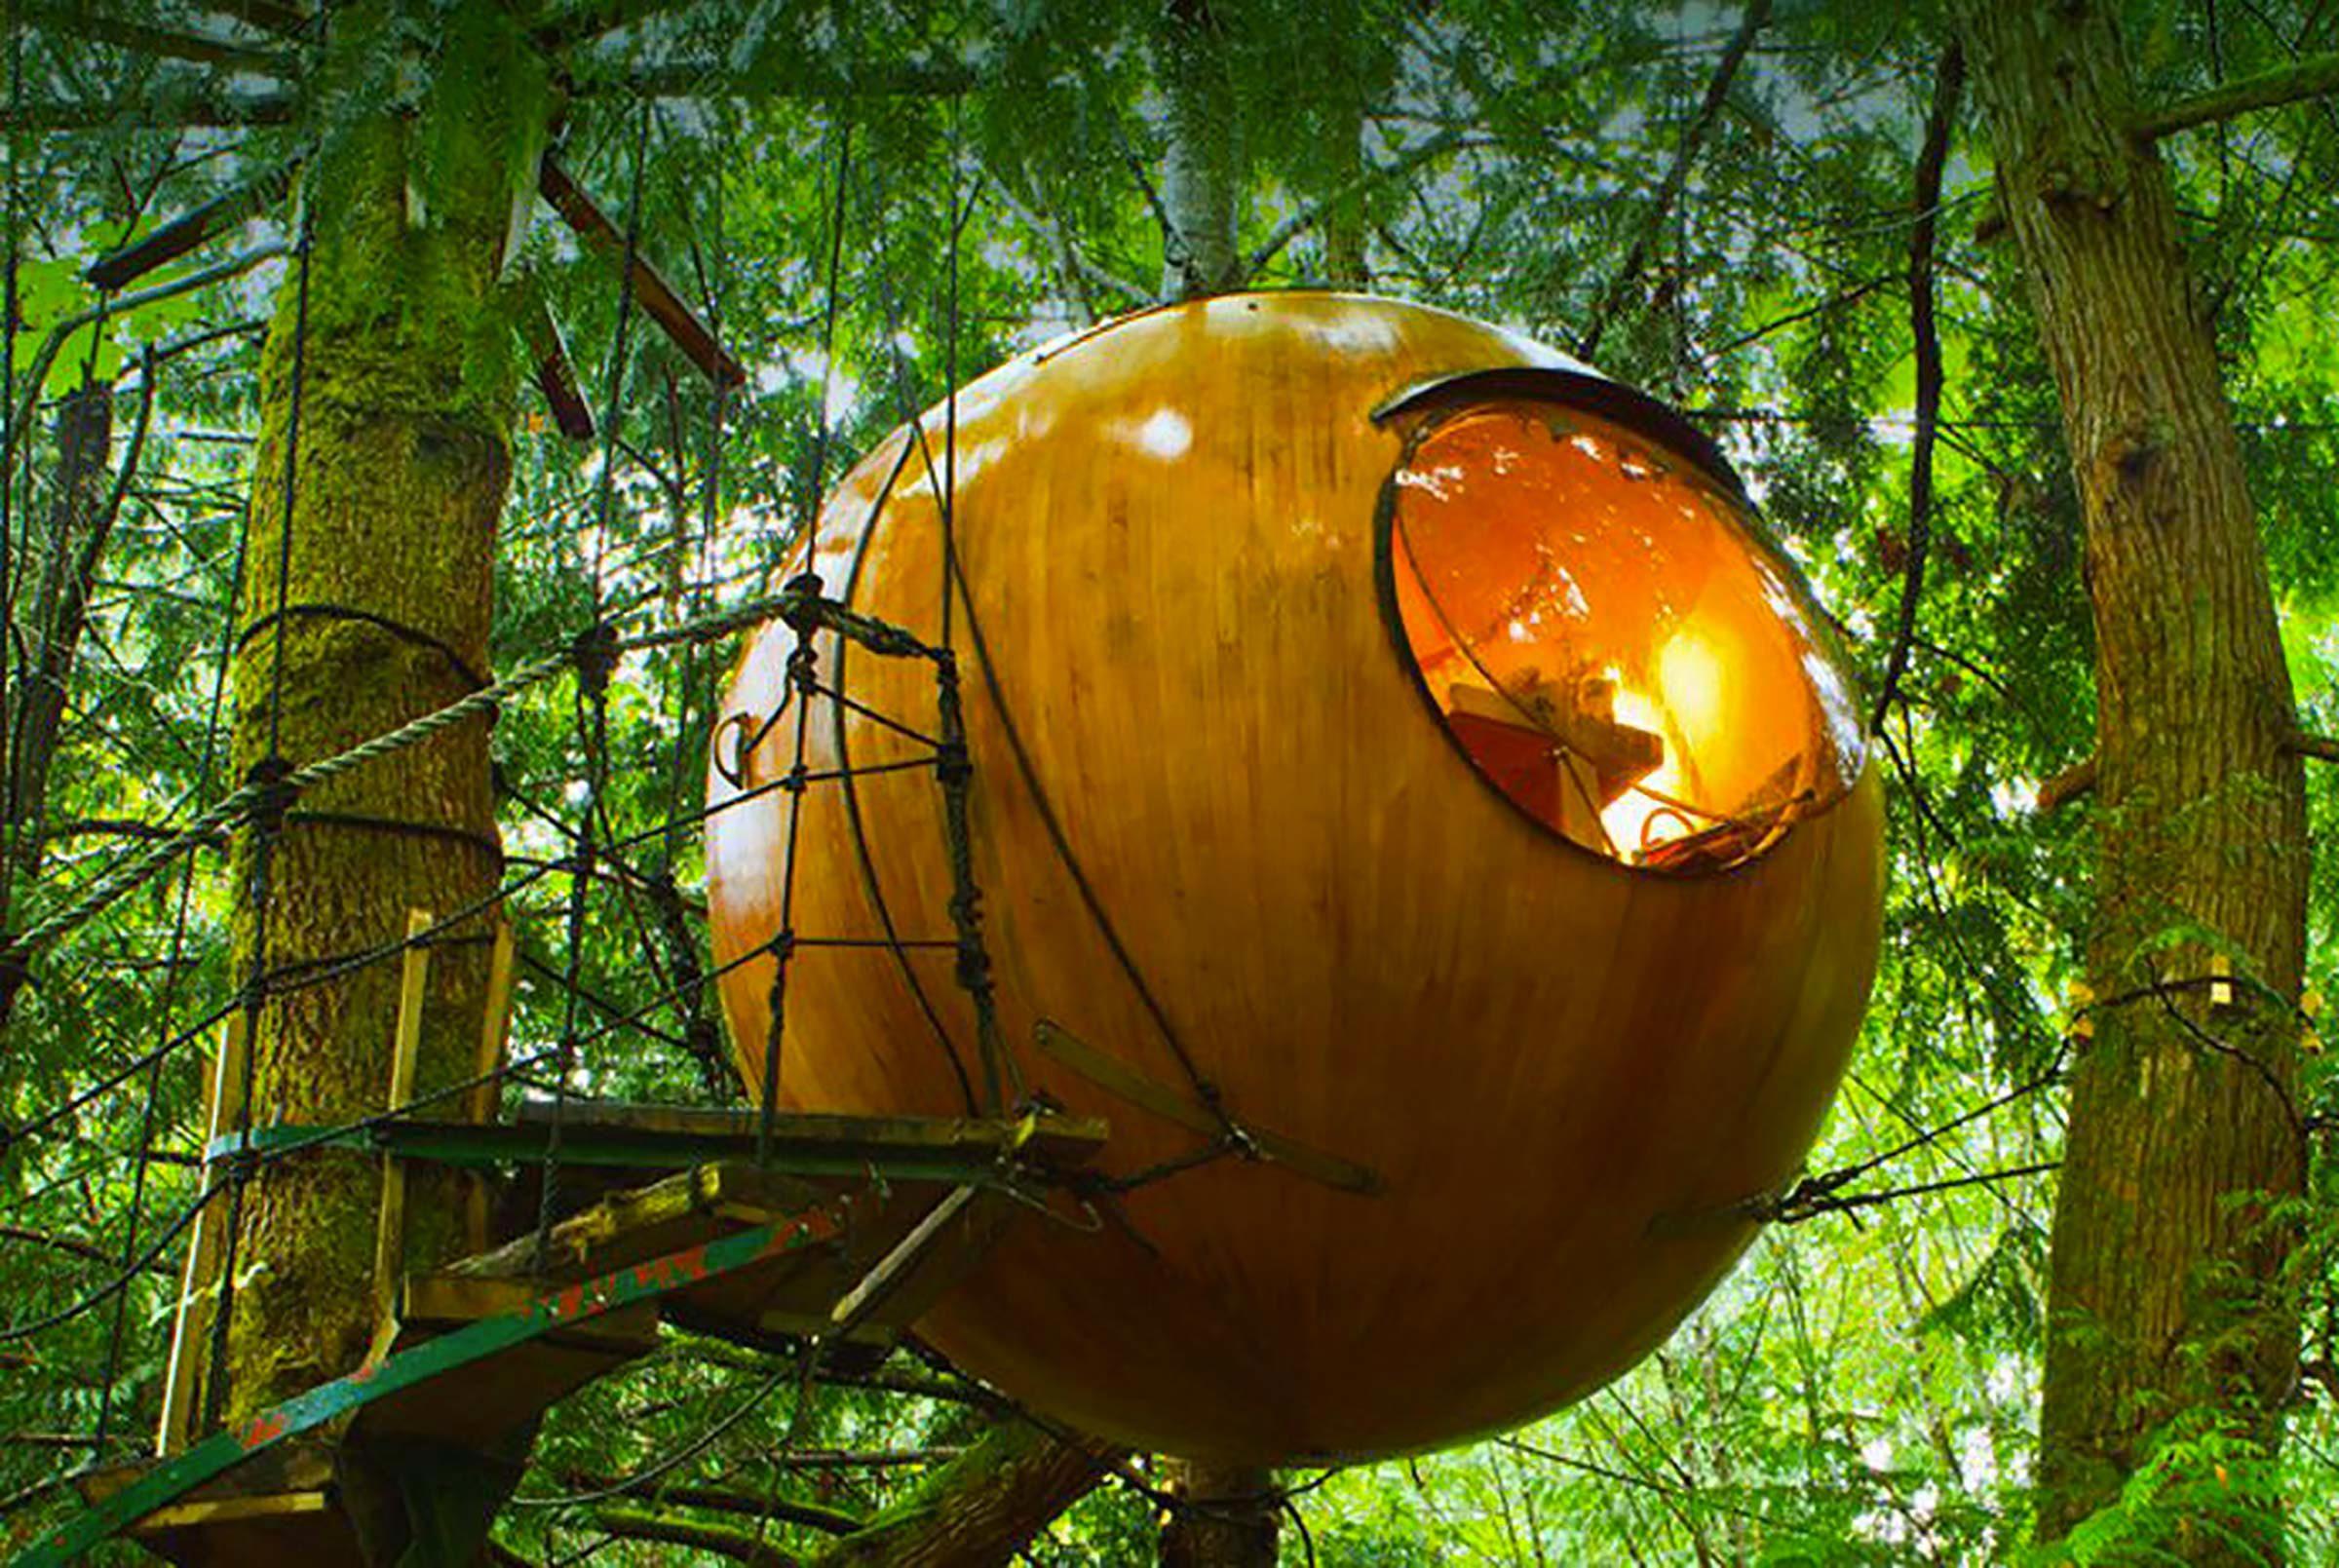 Séjour insolite à Free Spirit Spheres, Qualicum Beach en Colombie Britannique.